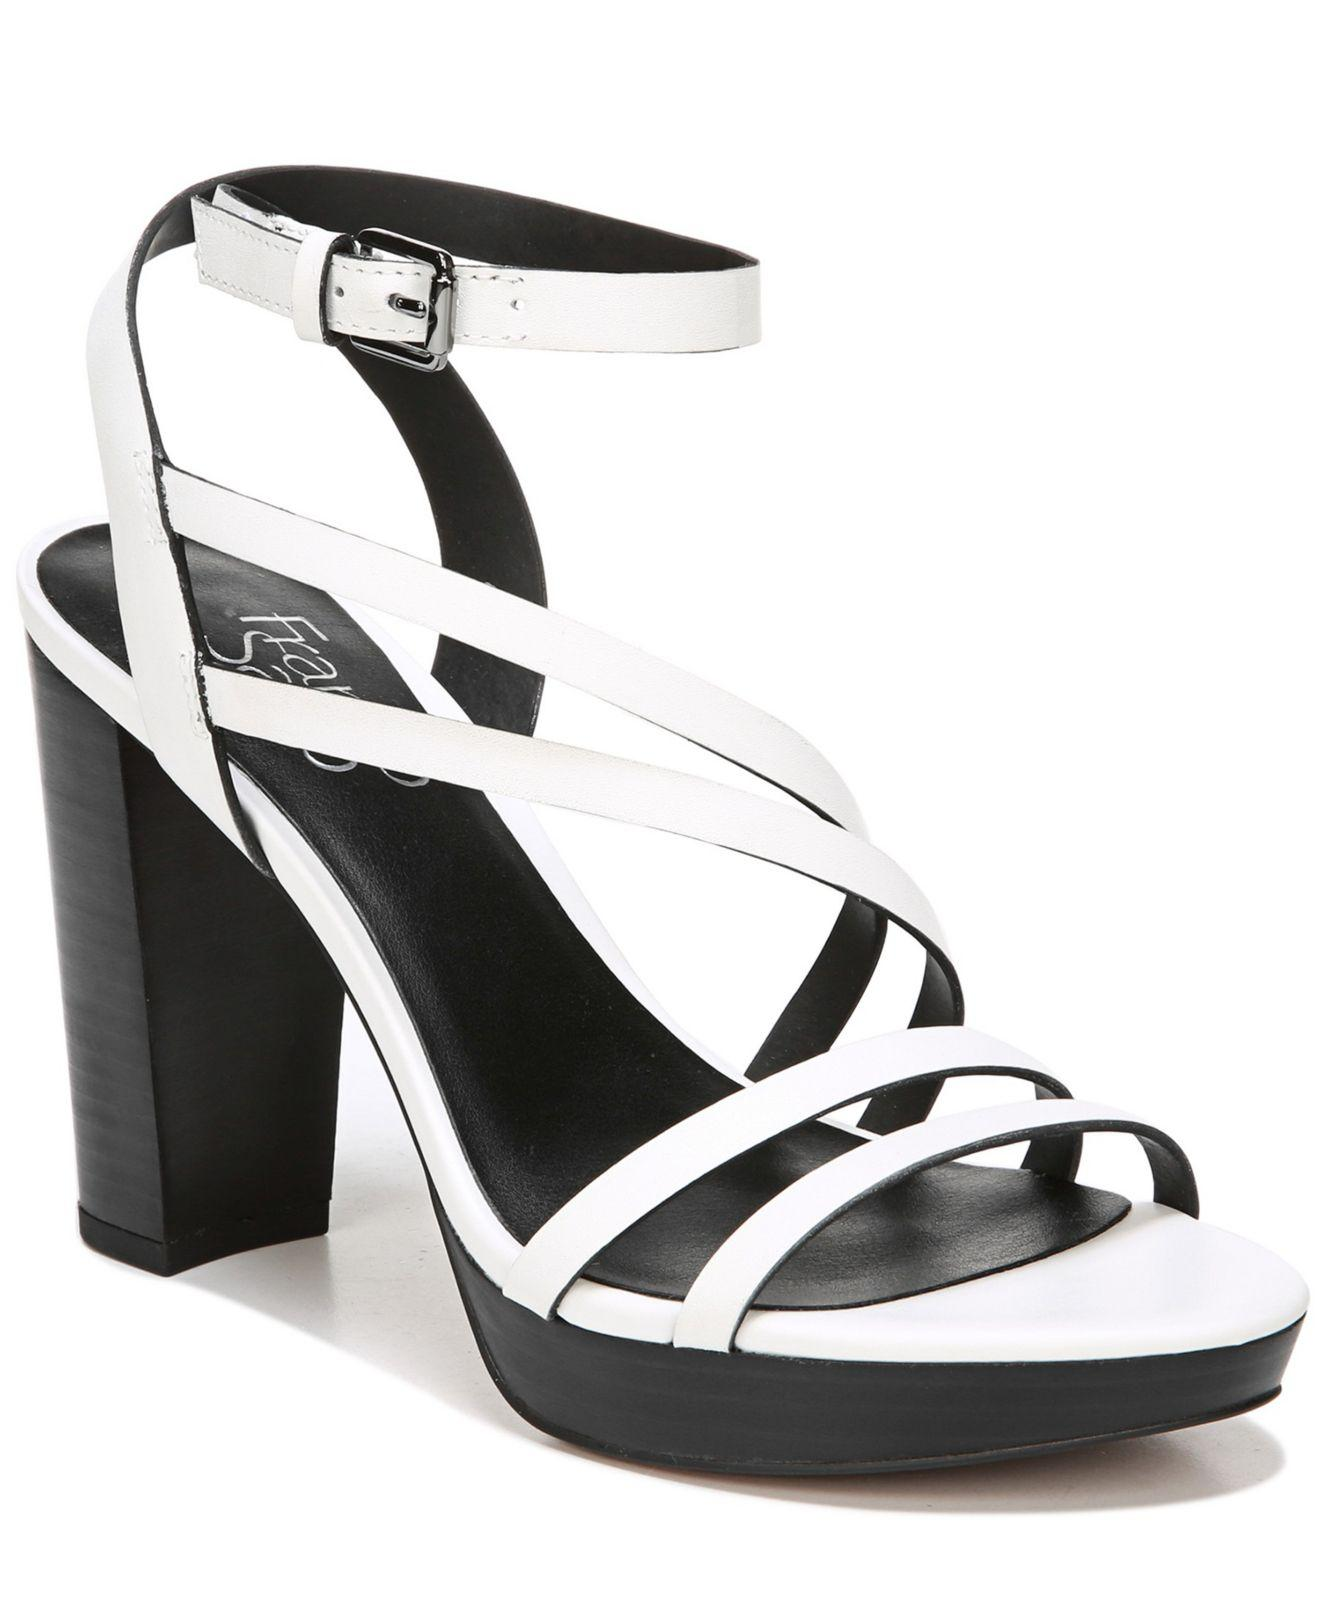 b952e337e05779 Lyst - Franco Sarto Maryann Platform Dress Sandals in White